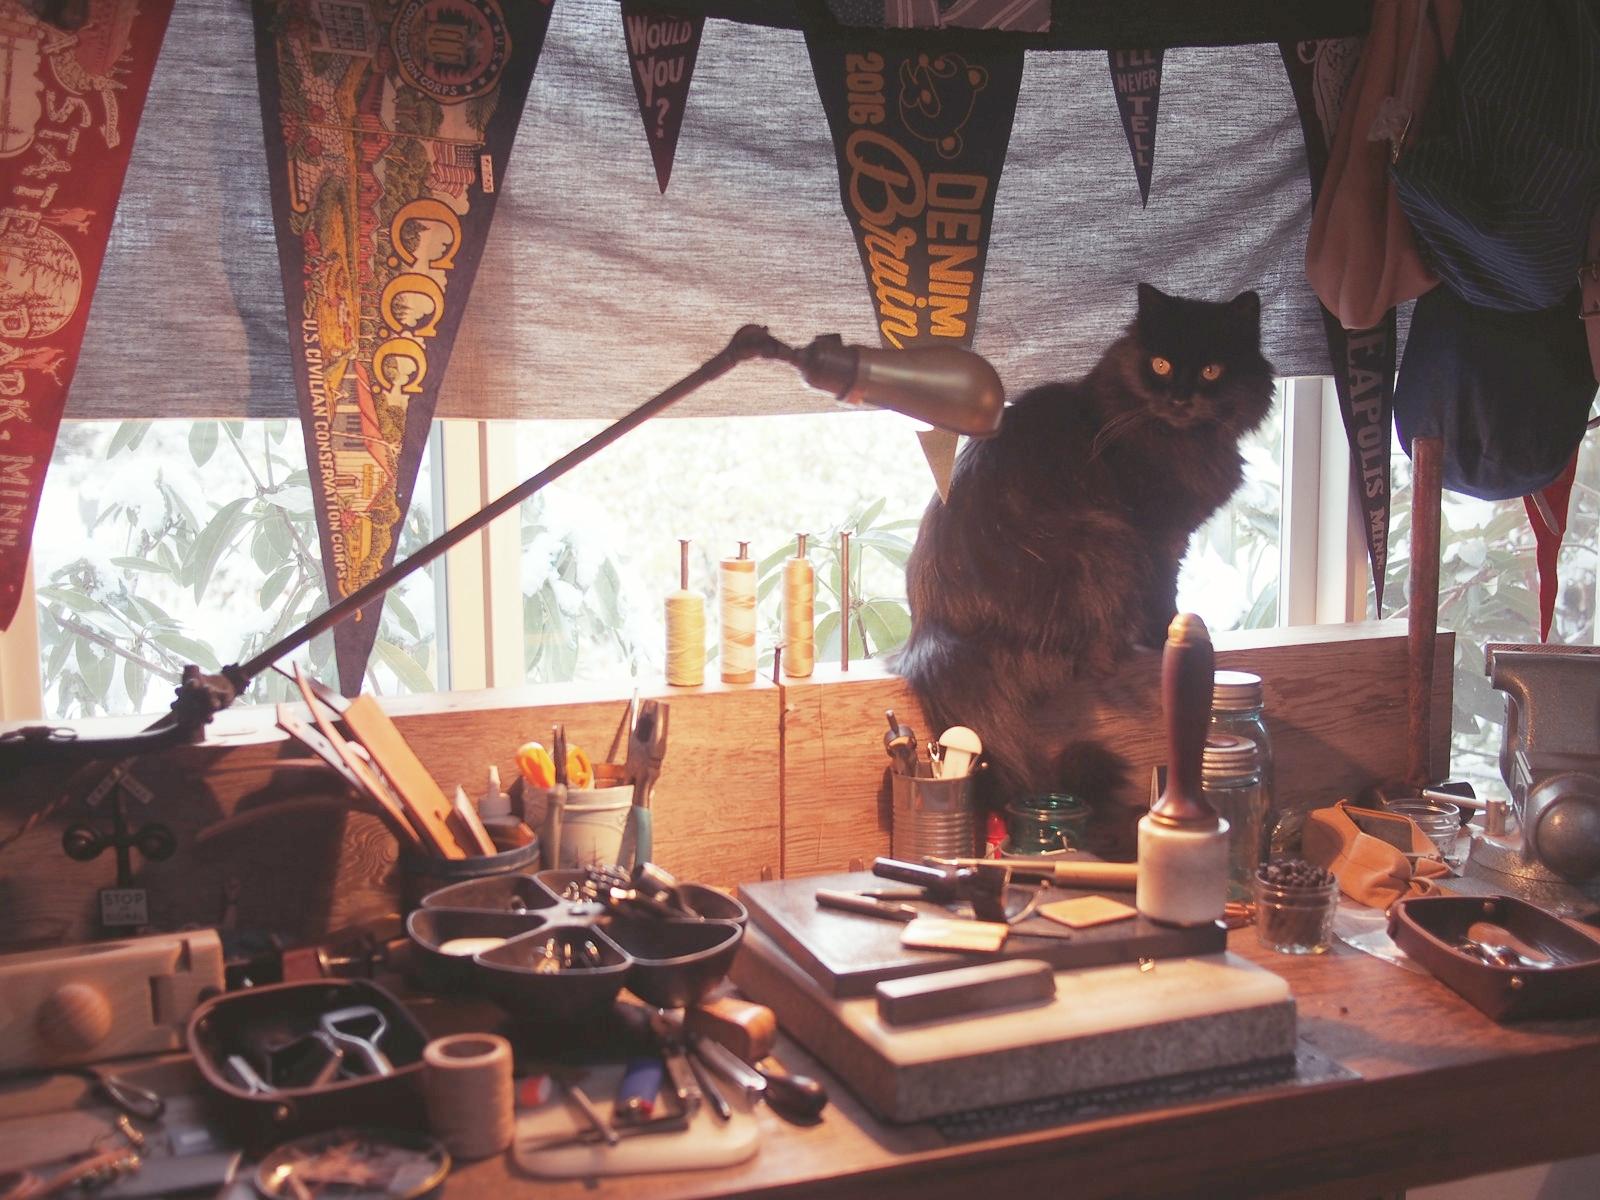 Nicholas-hollows-leather-beast-blog-feature 6.jpg